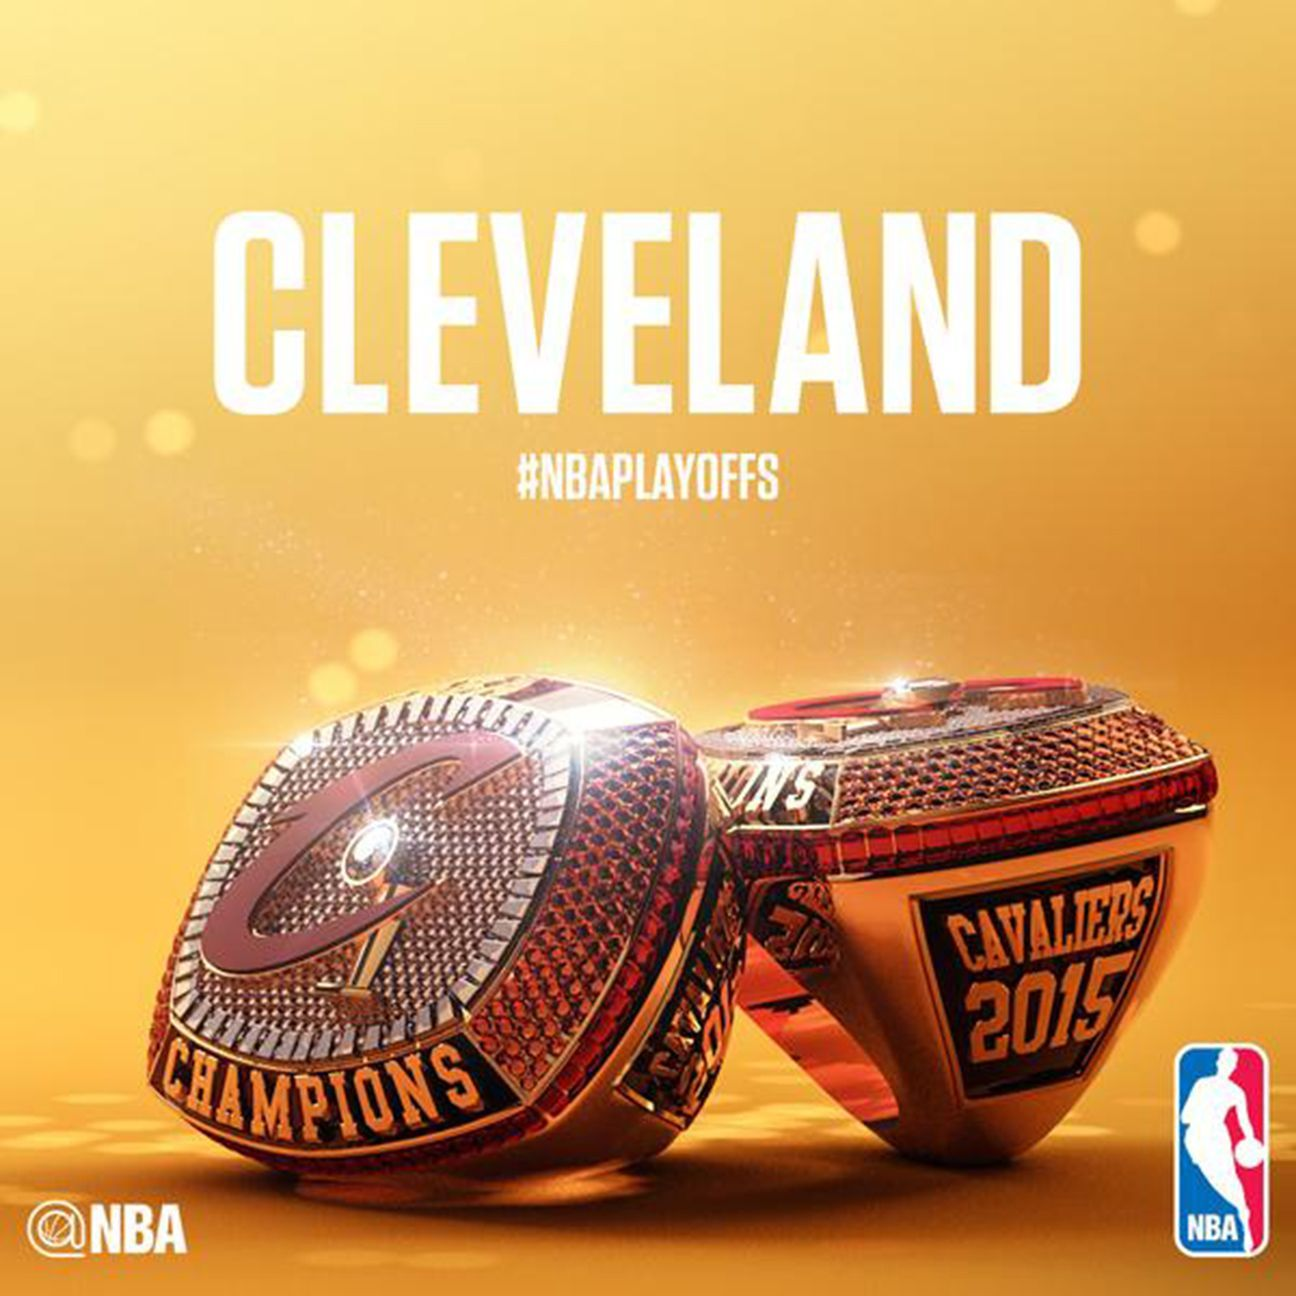 Cleveland Cavaliers Championship Ring Conceptual Design Lebron